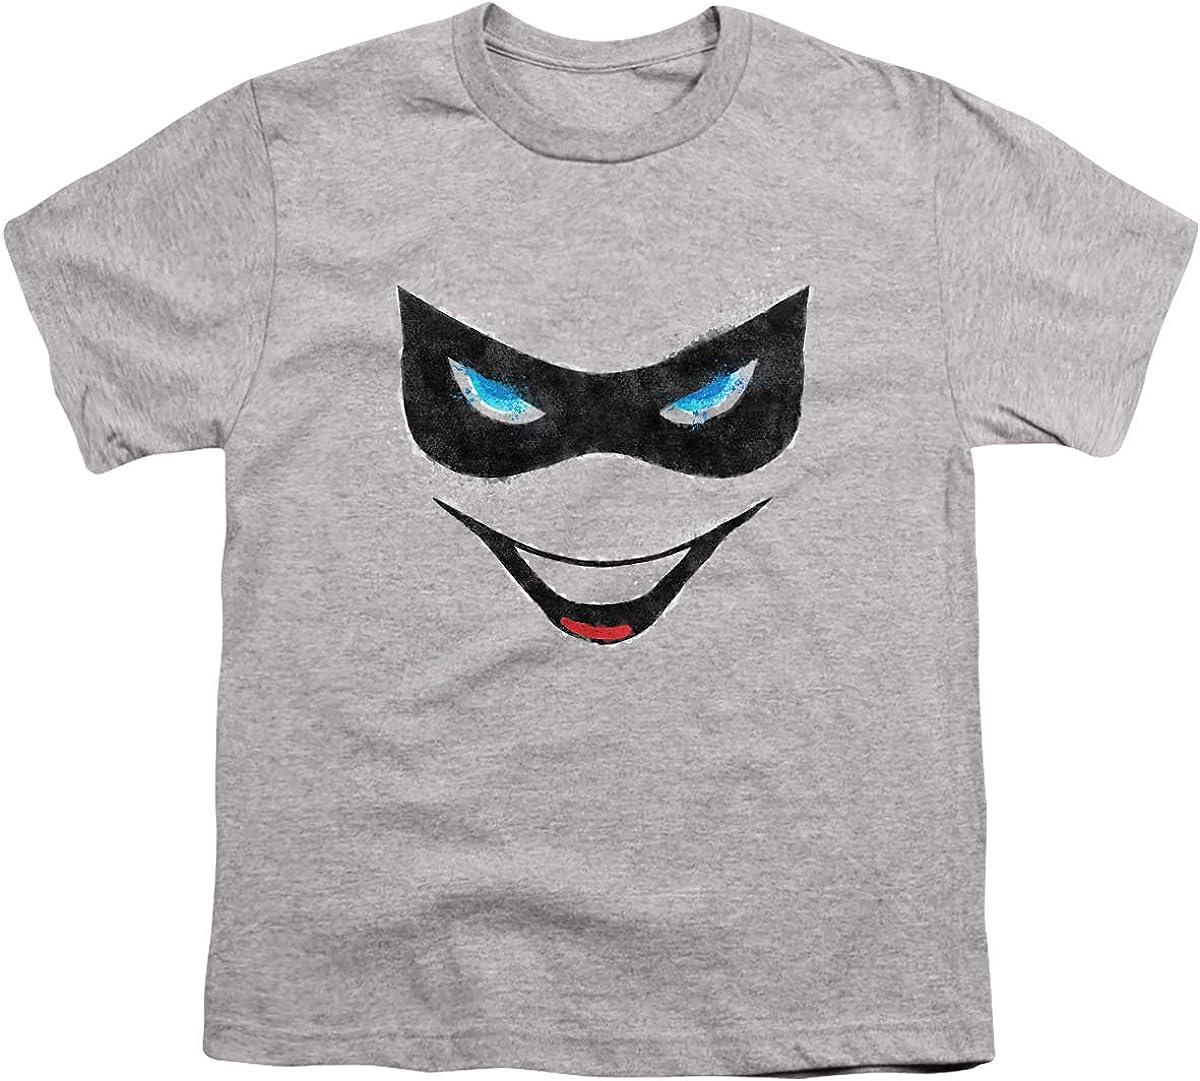 Batman Harley Face Unisex Youth T Shirt